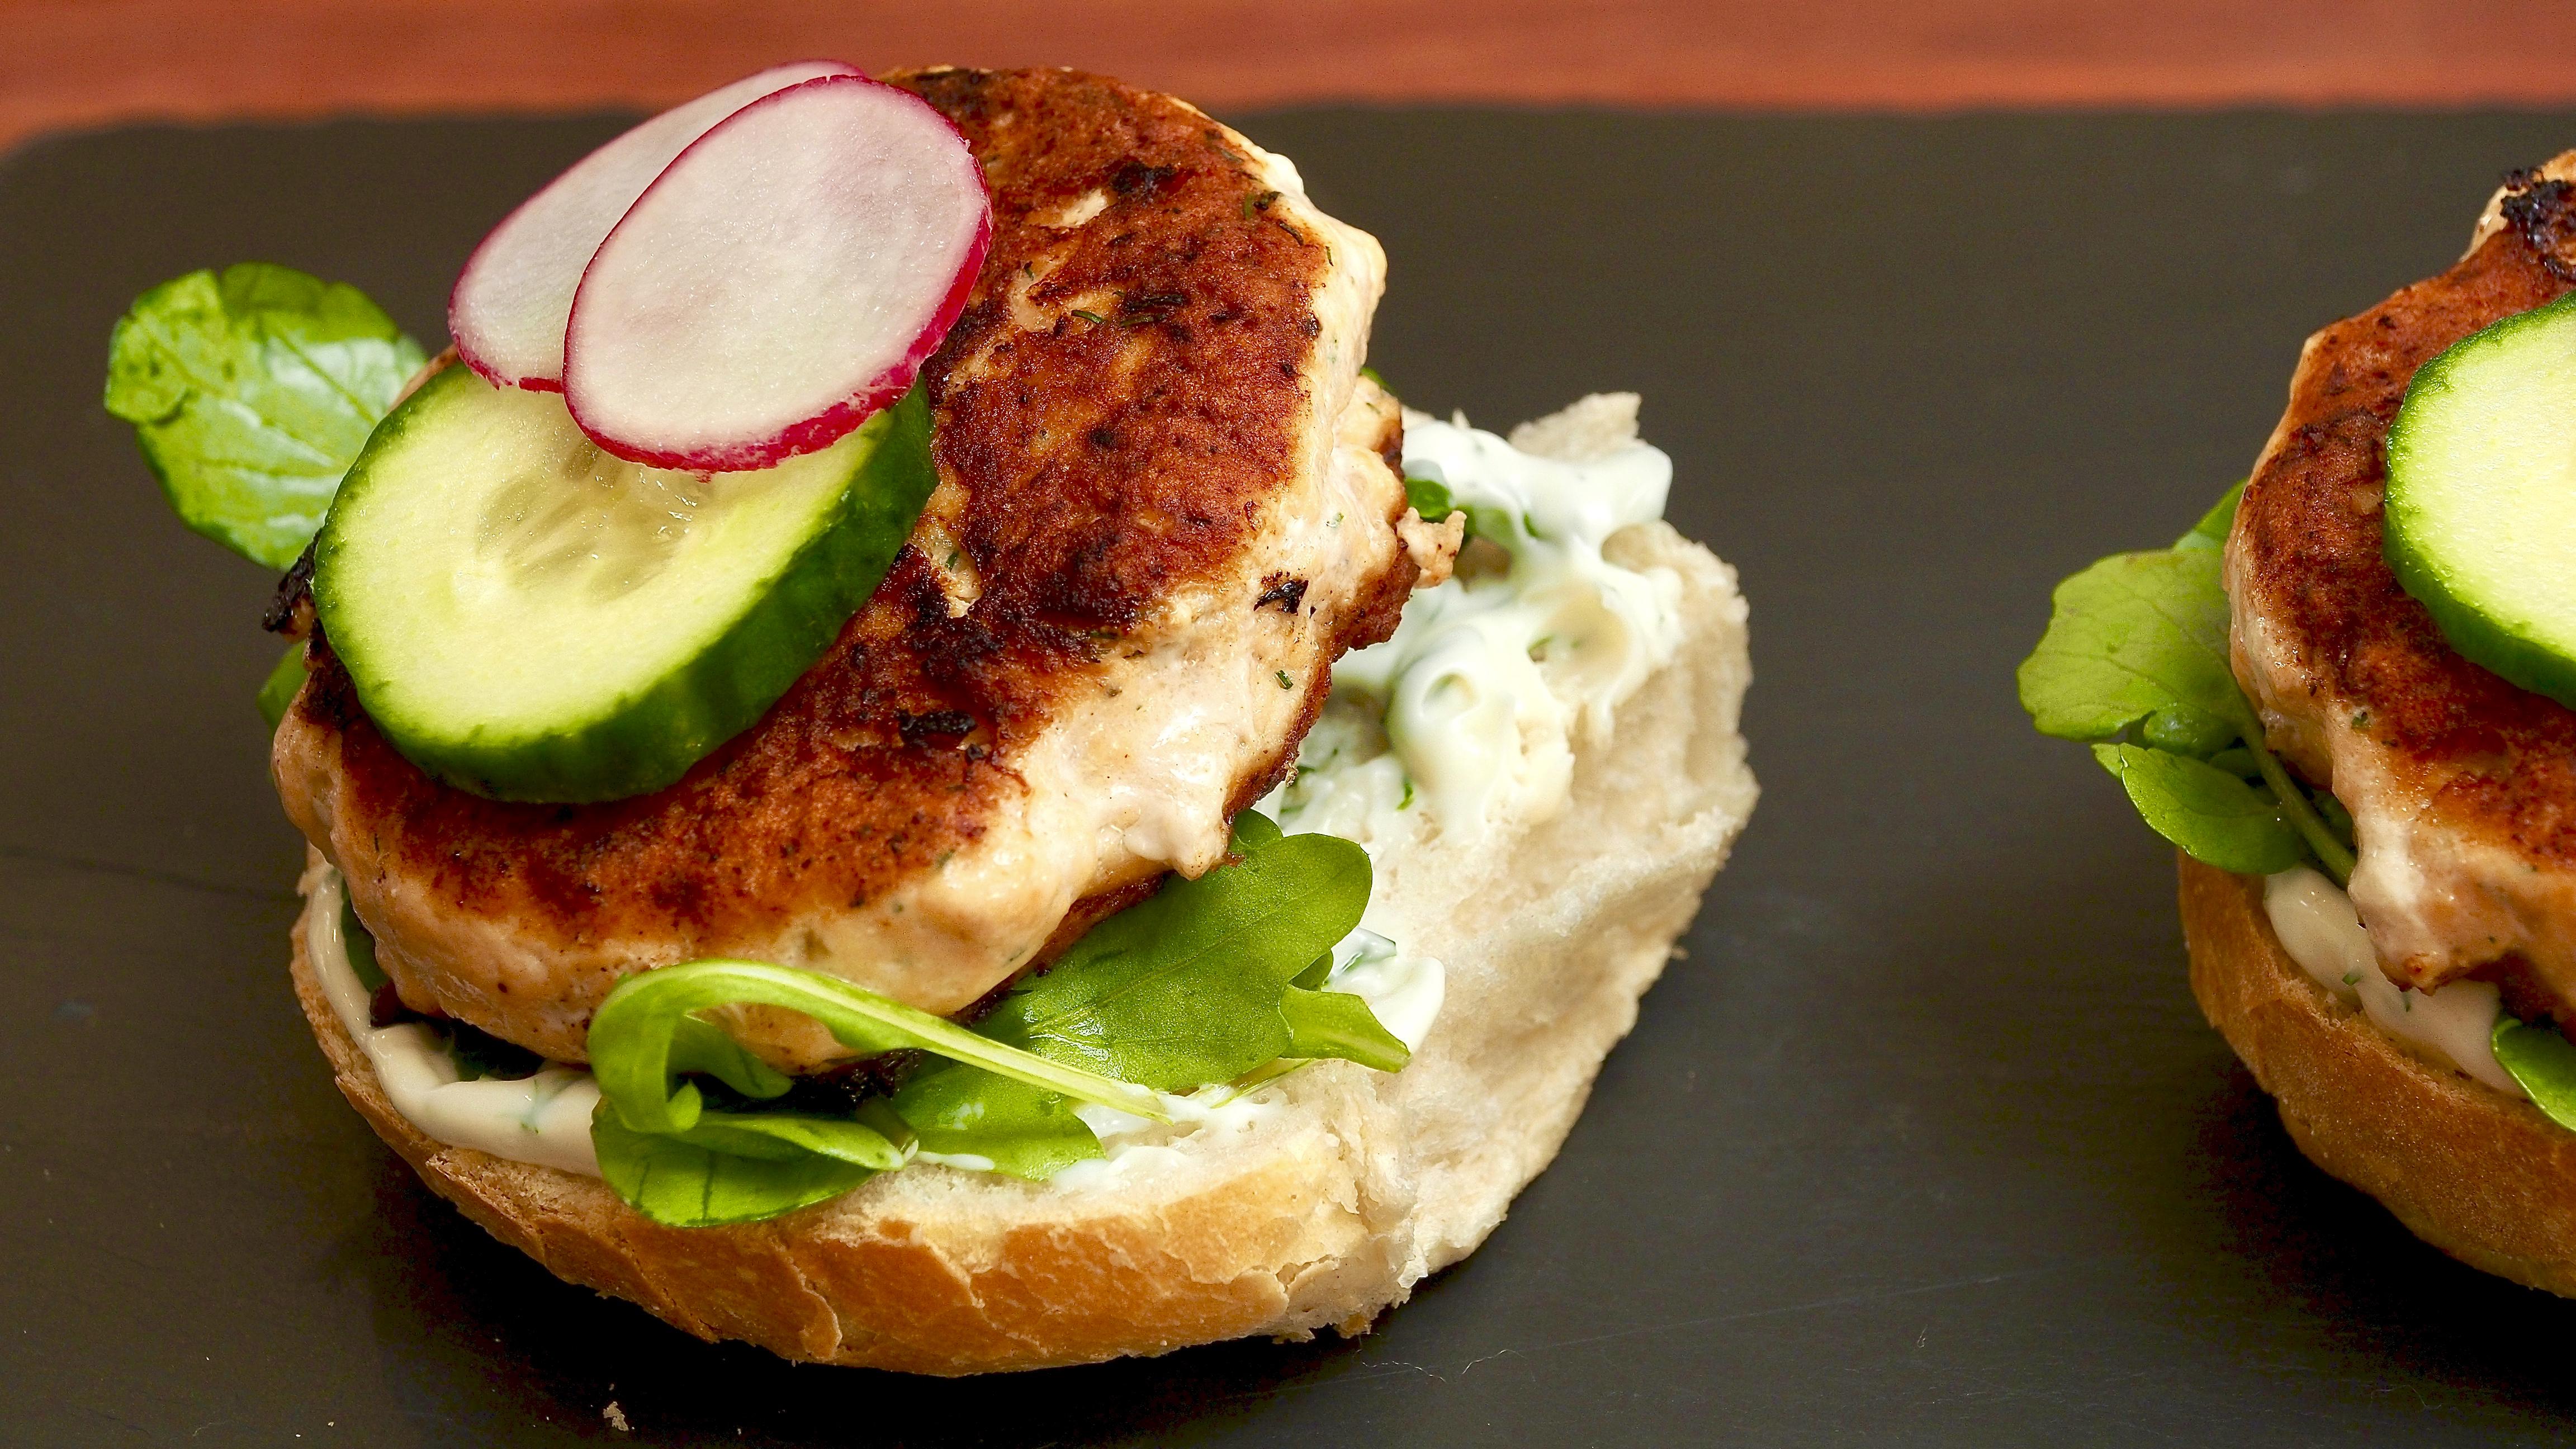 Salmon & horseradish burgers